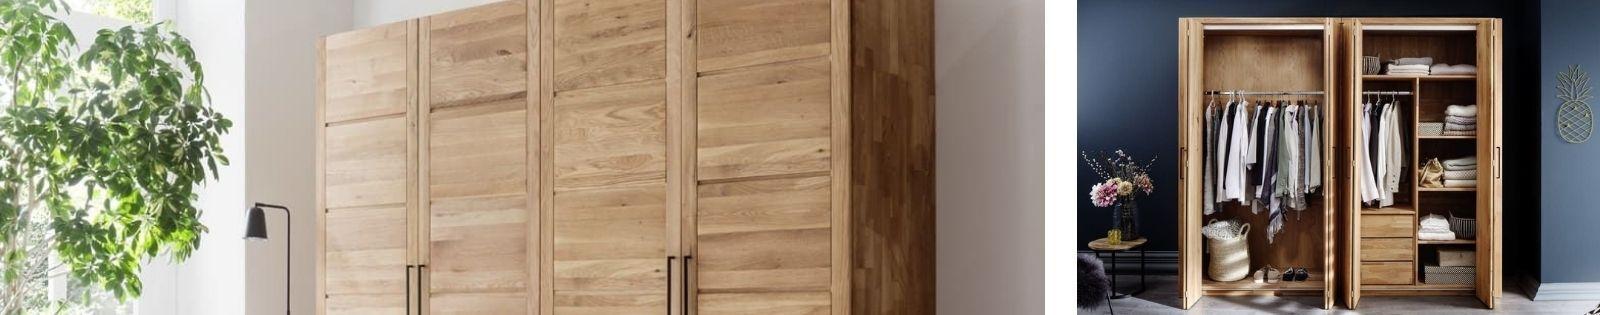 Armoire Haut de gamme en bambou, rotin, chêne, merisier, noyer massif - Le Monde du Lit